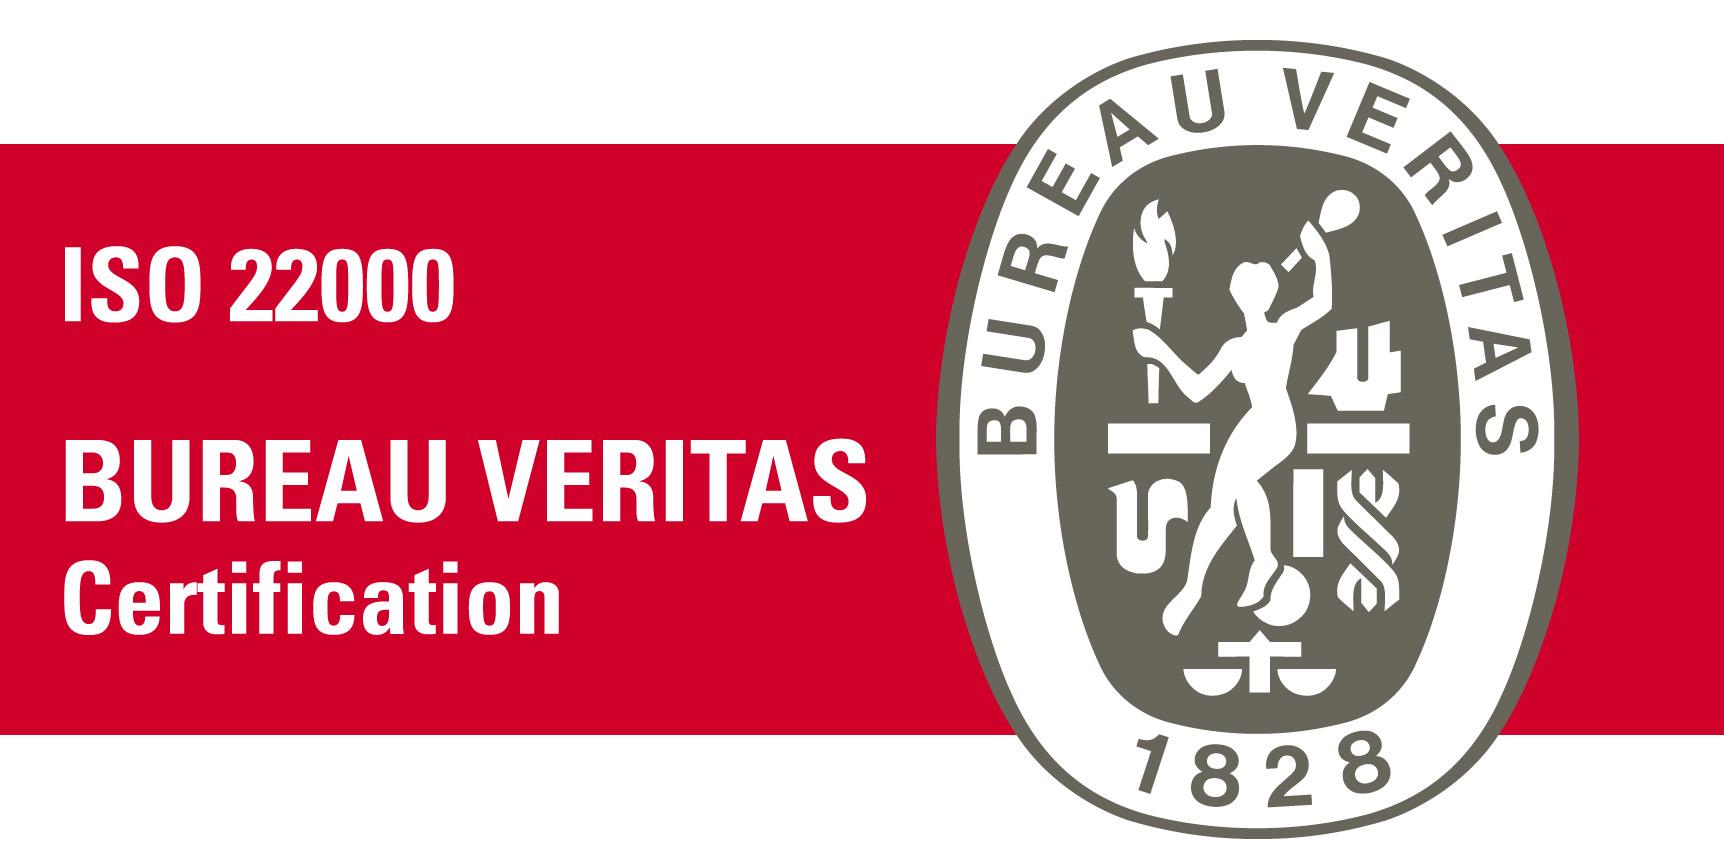 BV_Certification